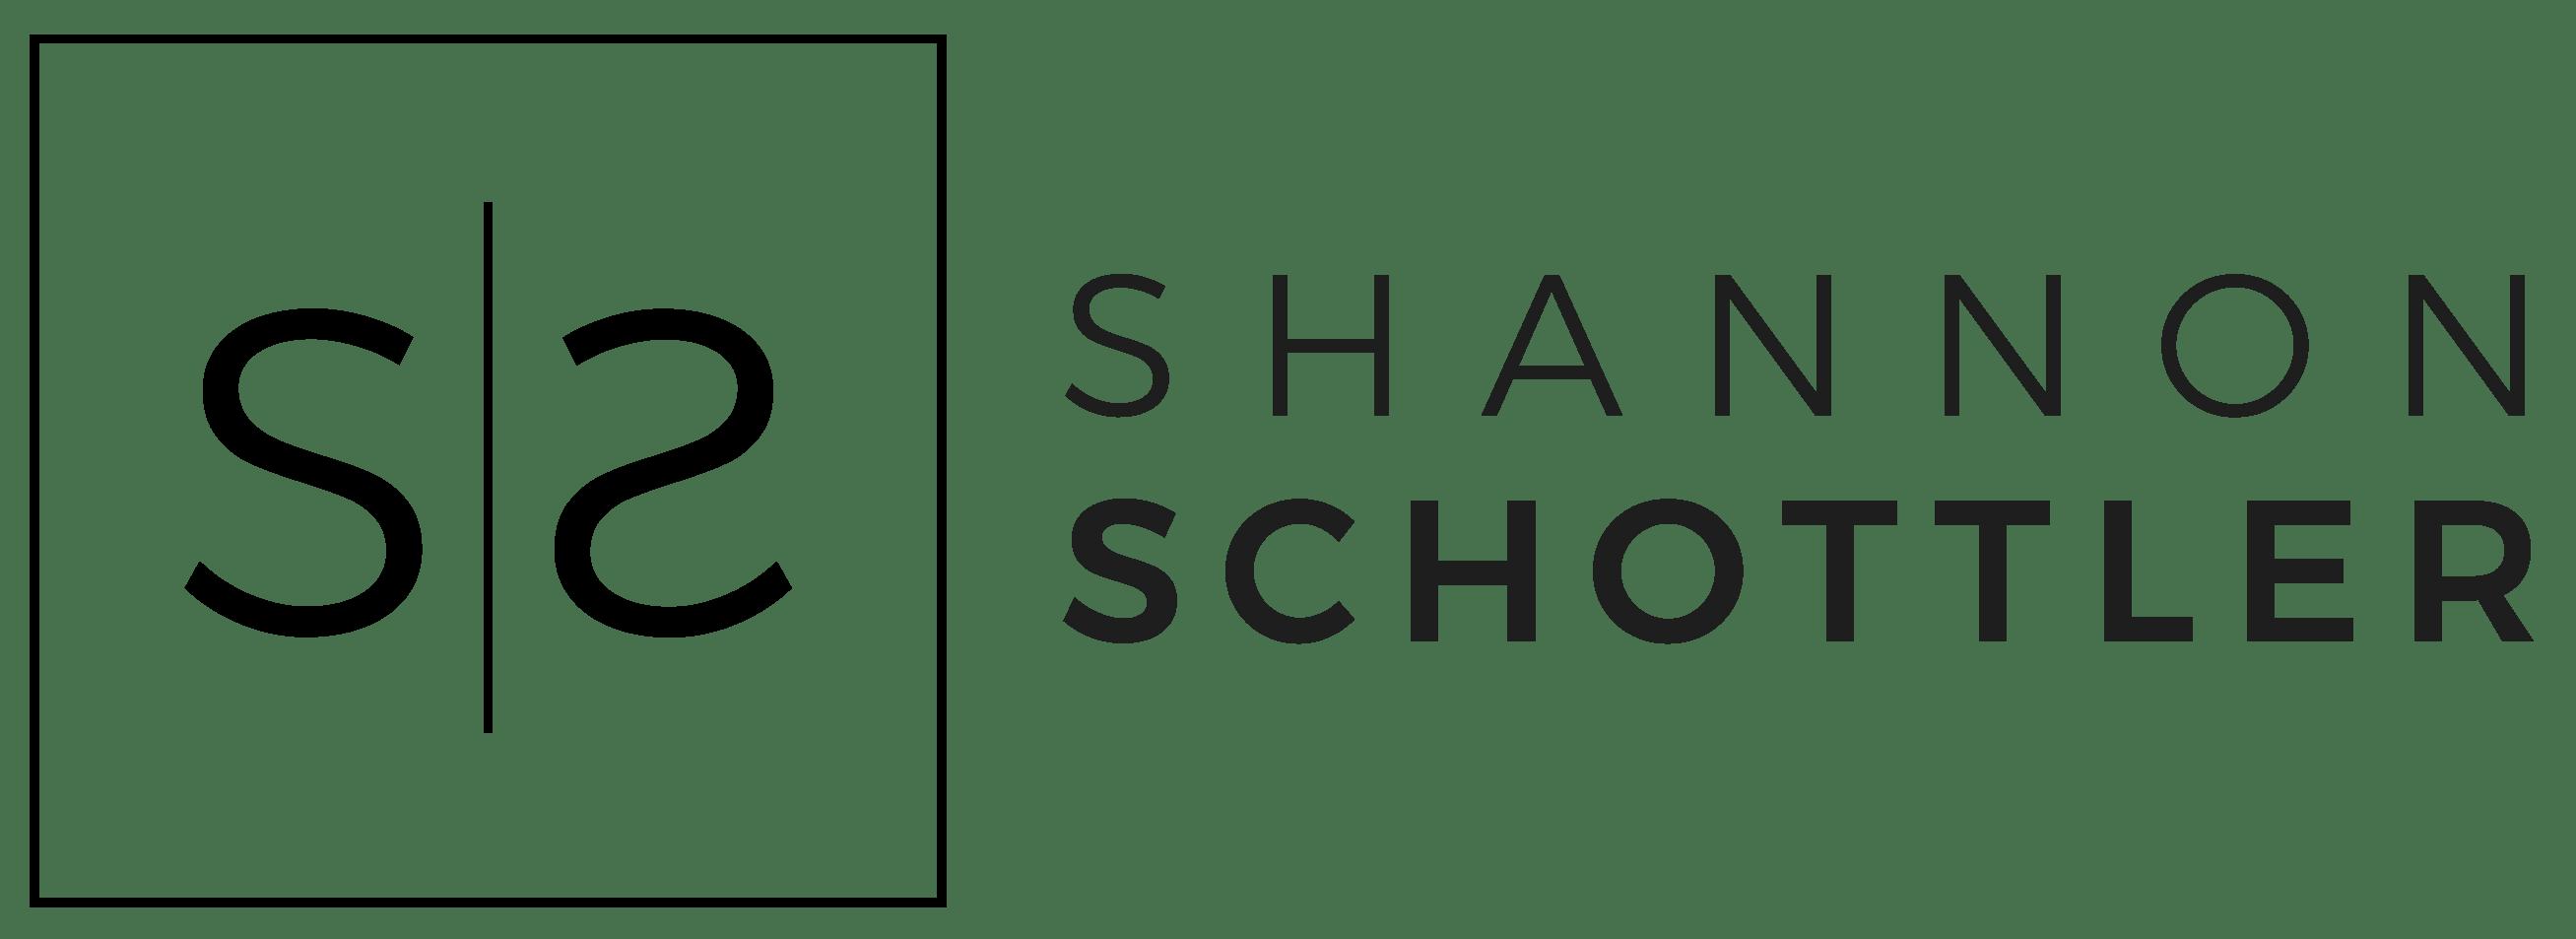 ShannonSchottler